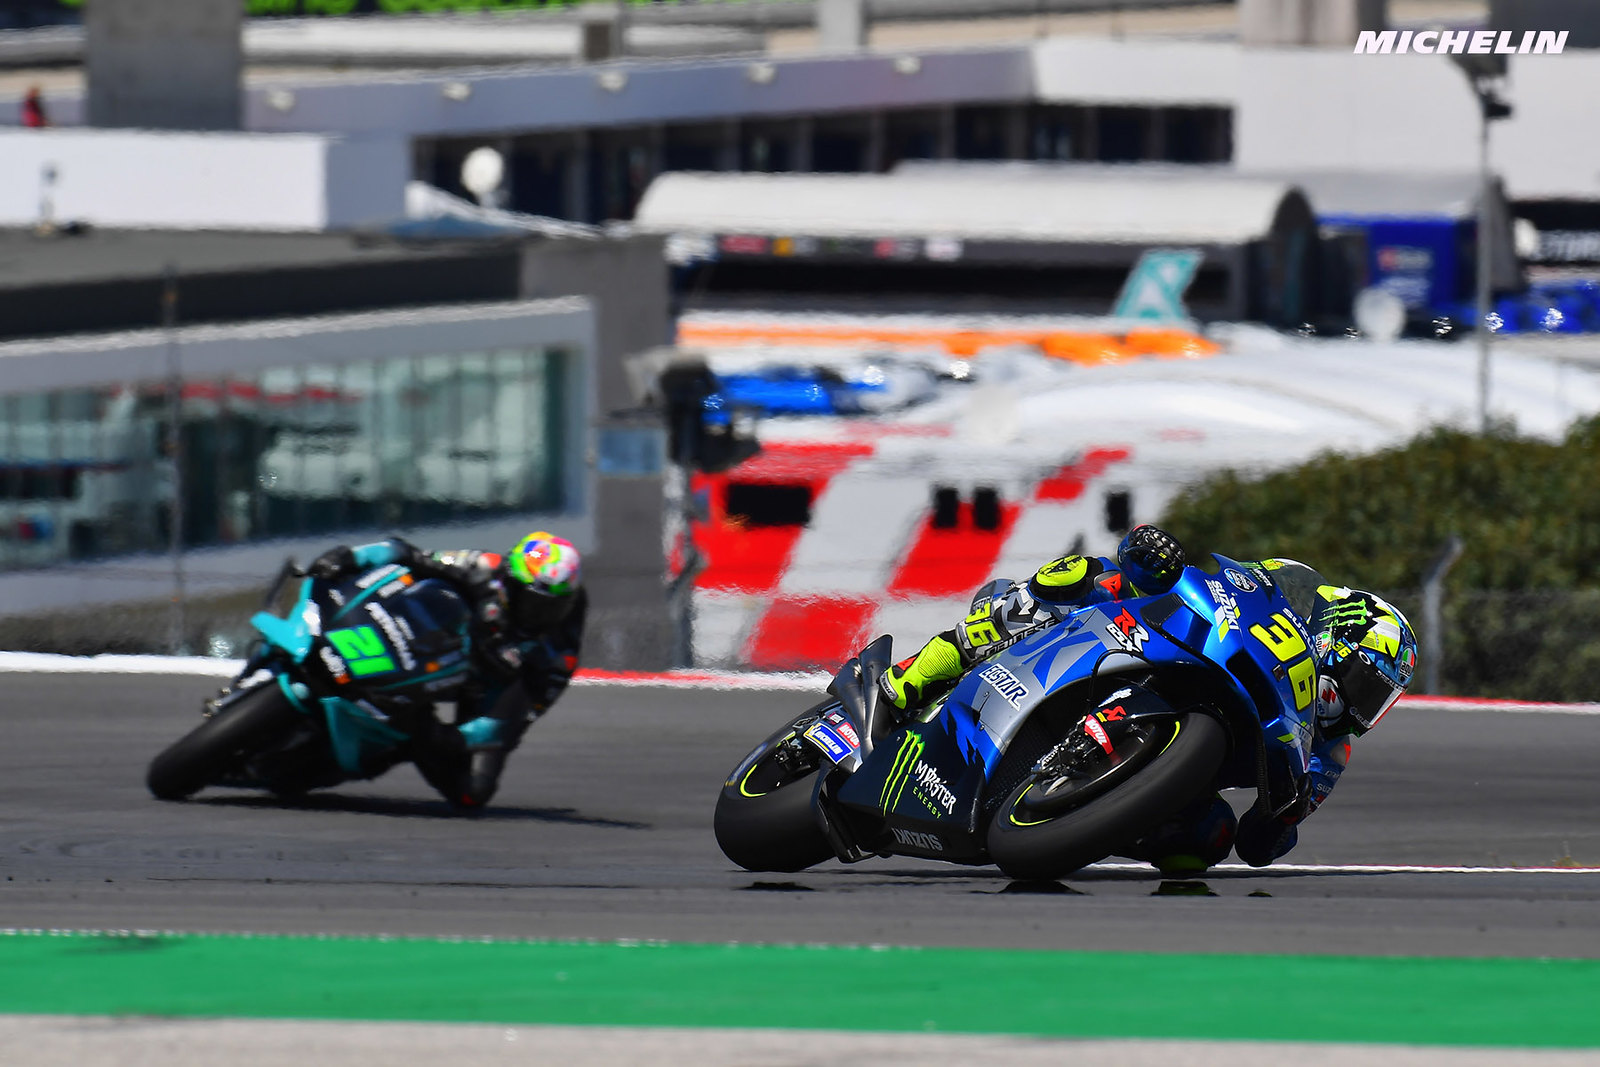 MotoGP2021 ポルトガルGP ジョアン・ミル「ベストとは言えない状況で表彰台を獲得出来た」